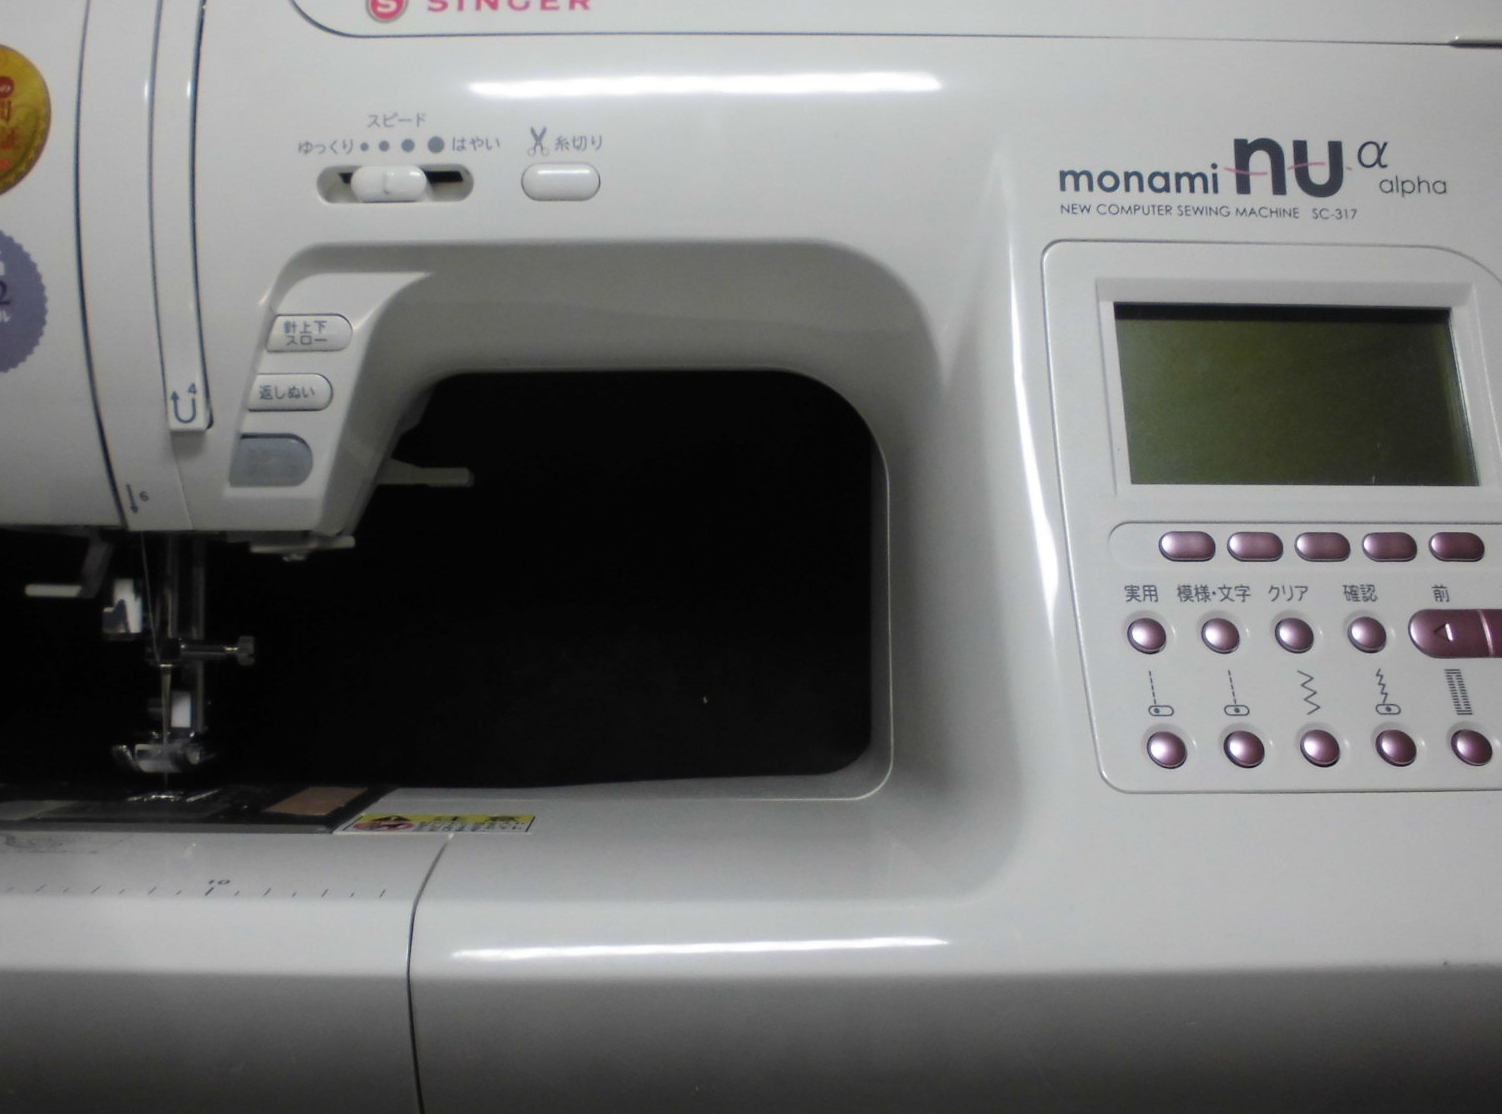 SINGERミシン修理|モナミヌウアルファ|SC-317|糸通し&糸切りの不具合